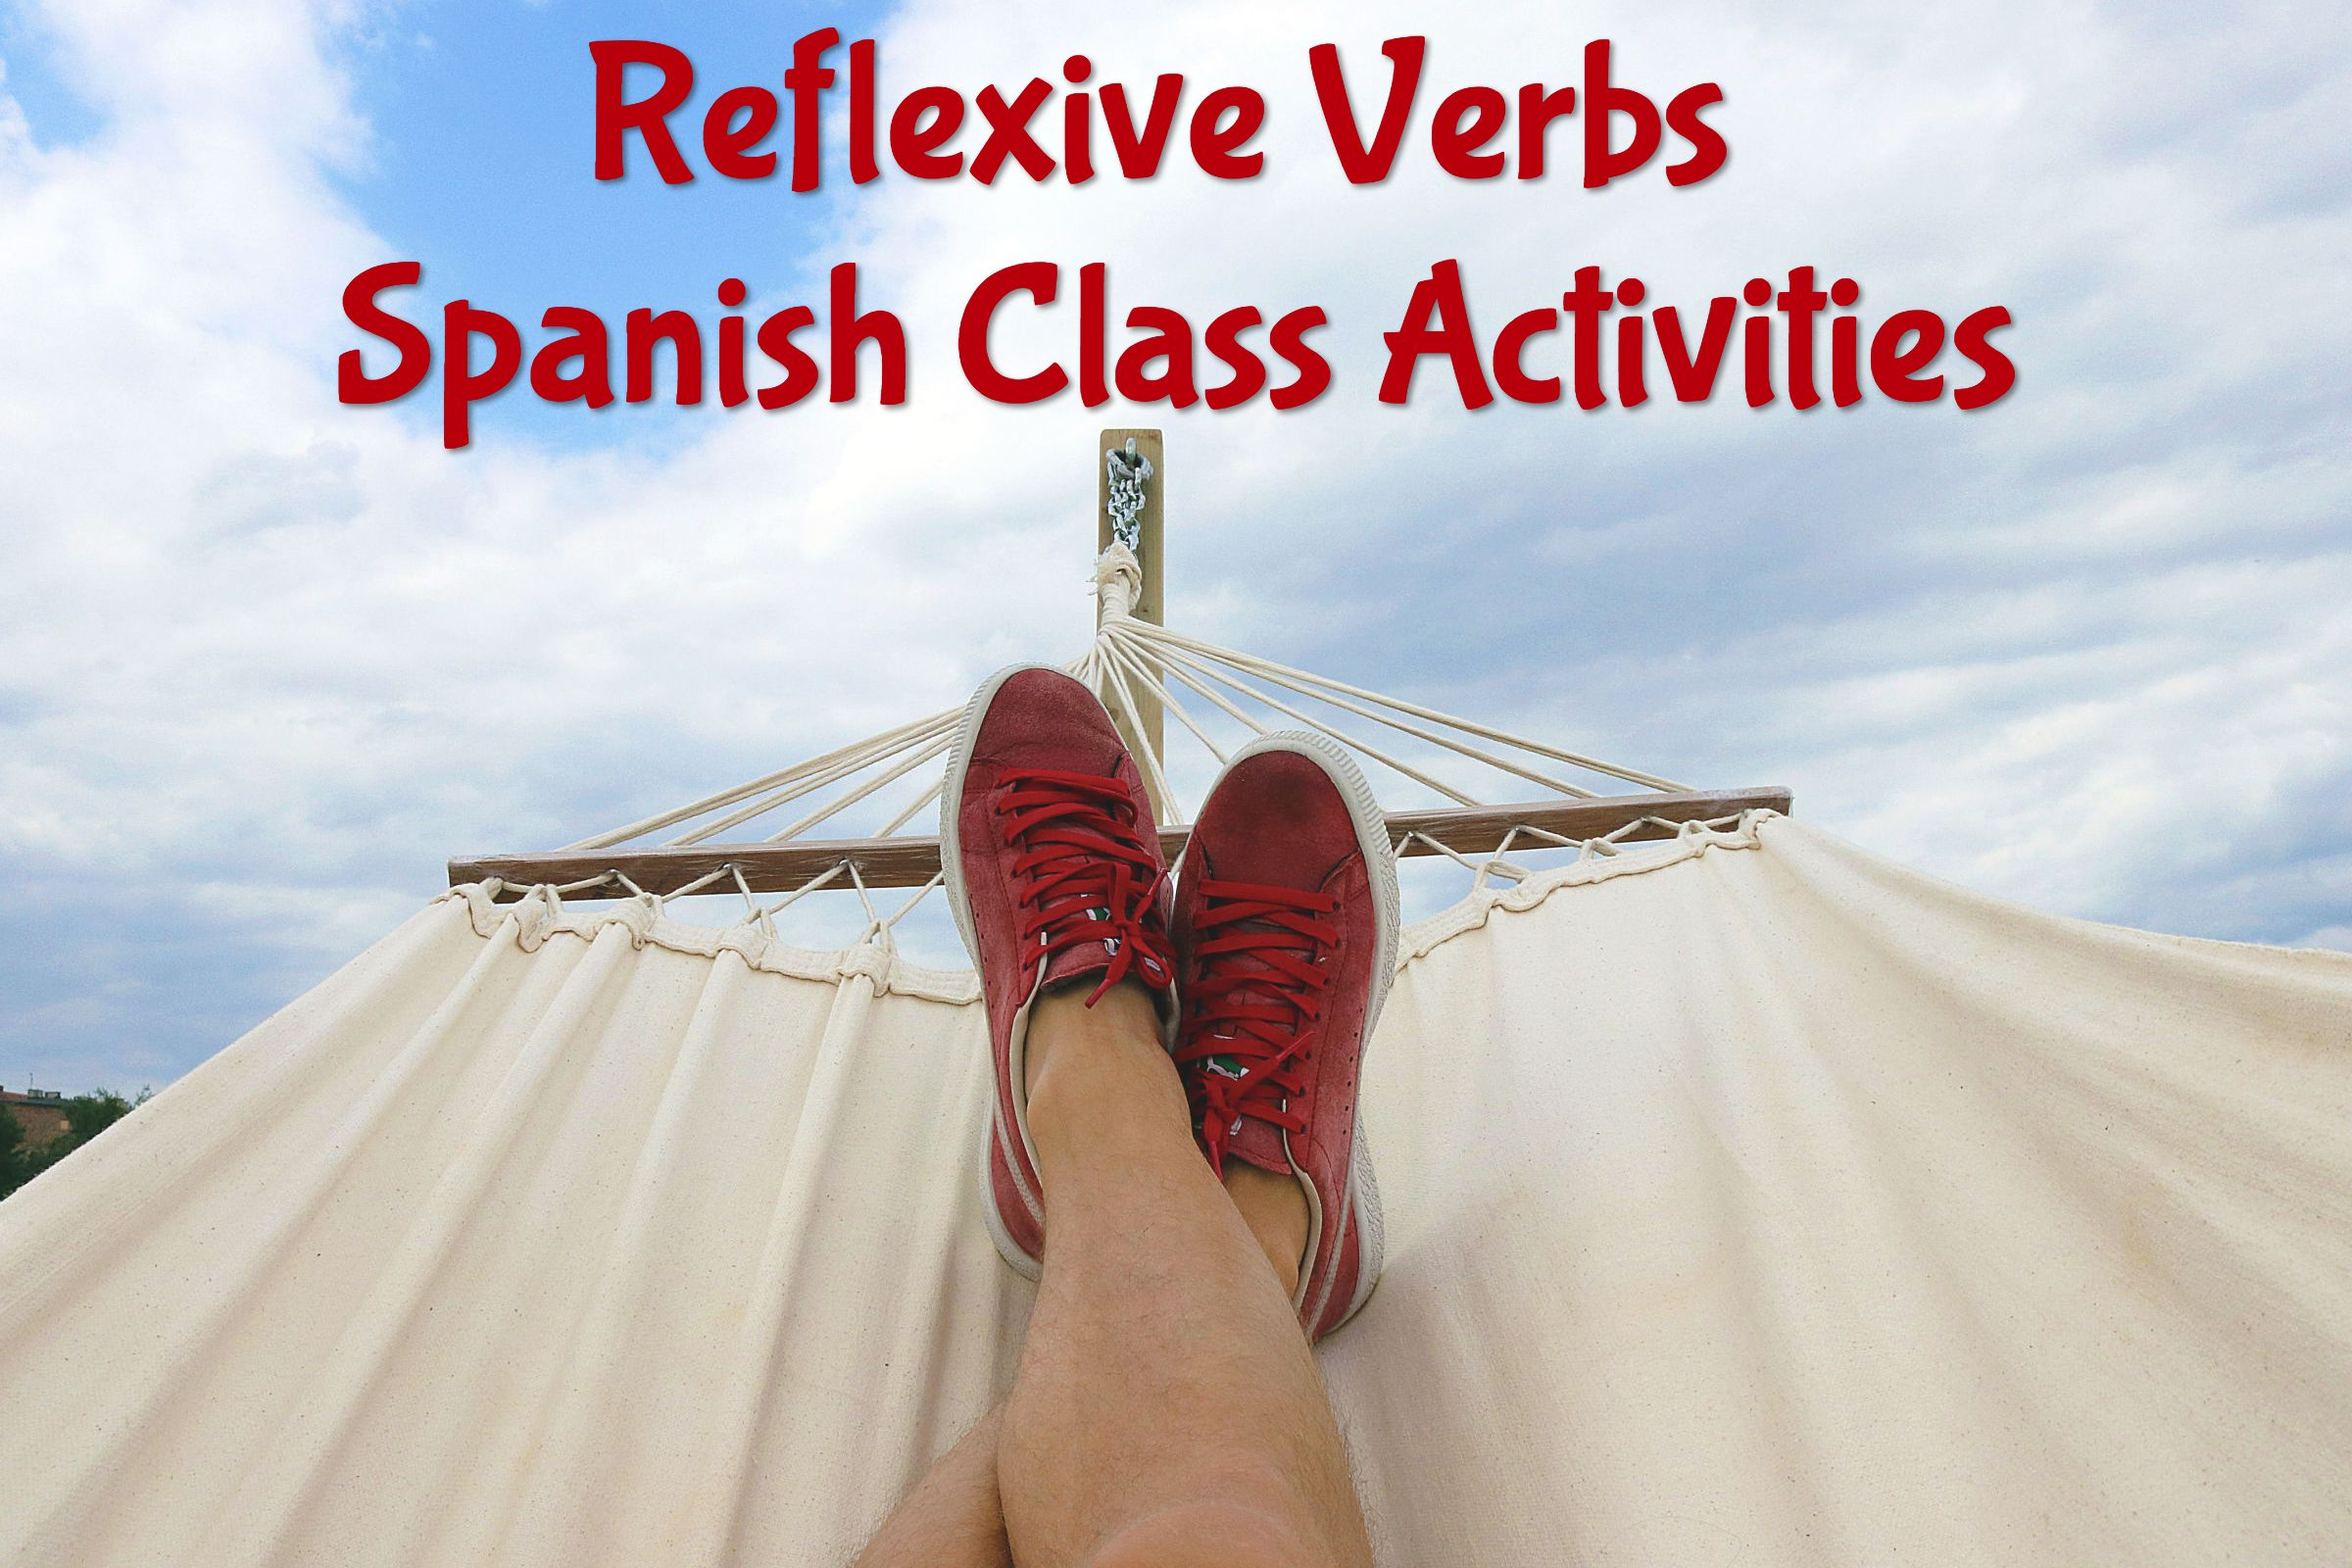 Reflexive Verbs Spanish Class Activities